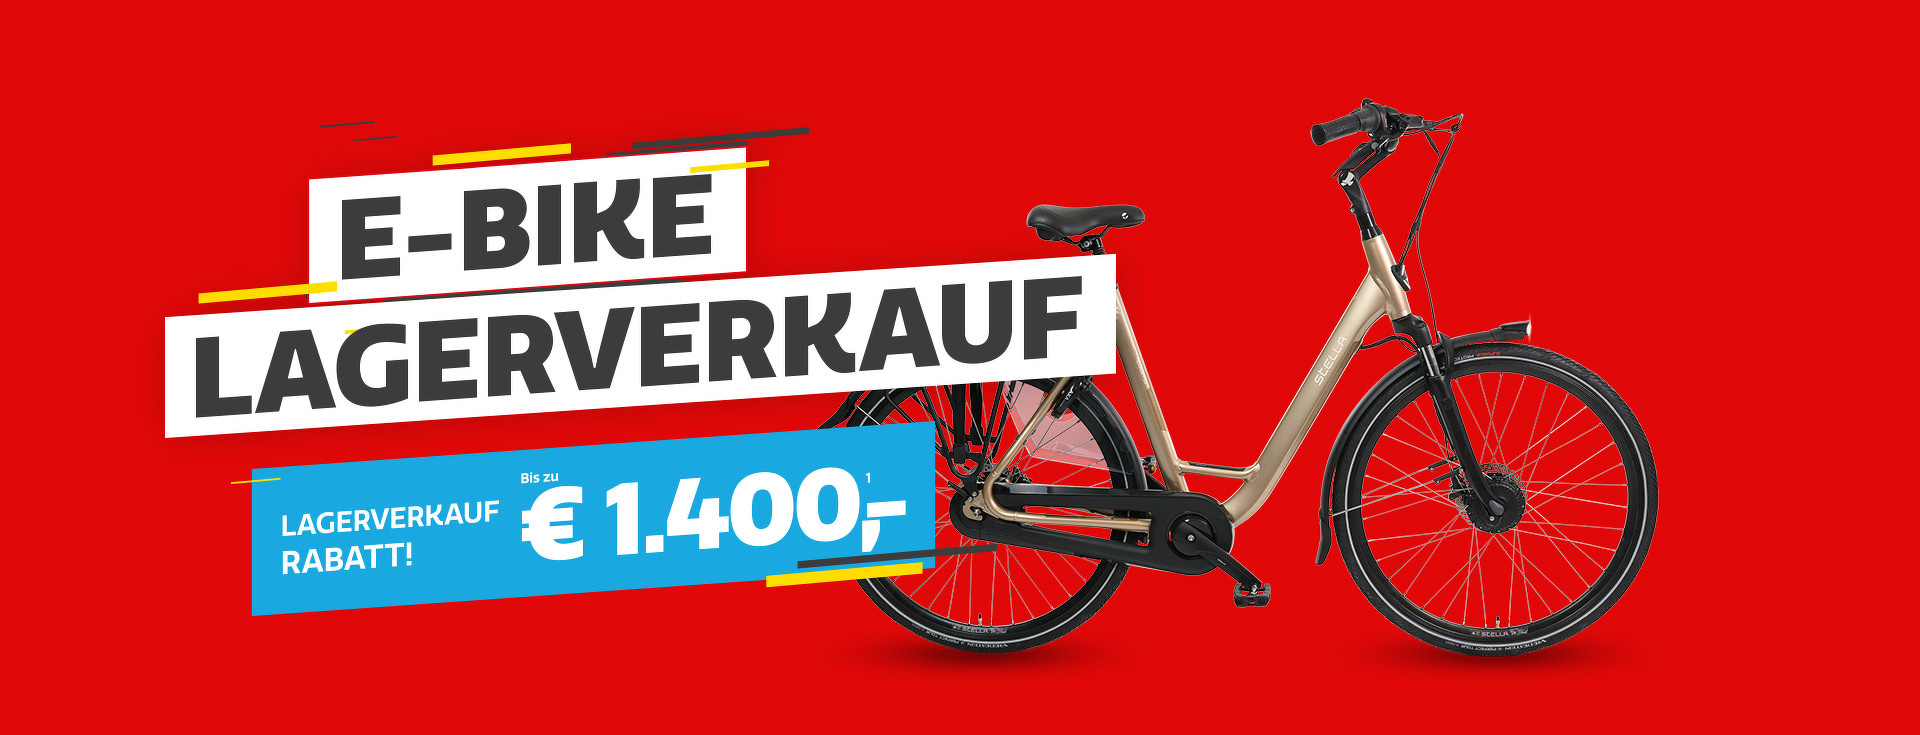 E-Bike Lagerverkauf